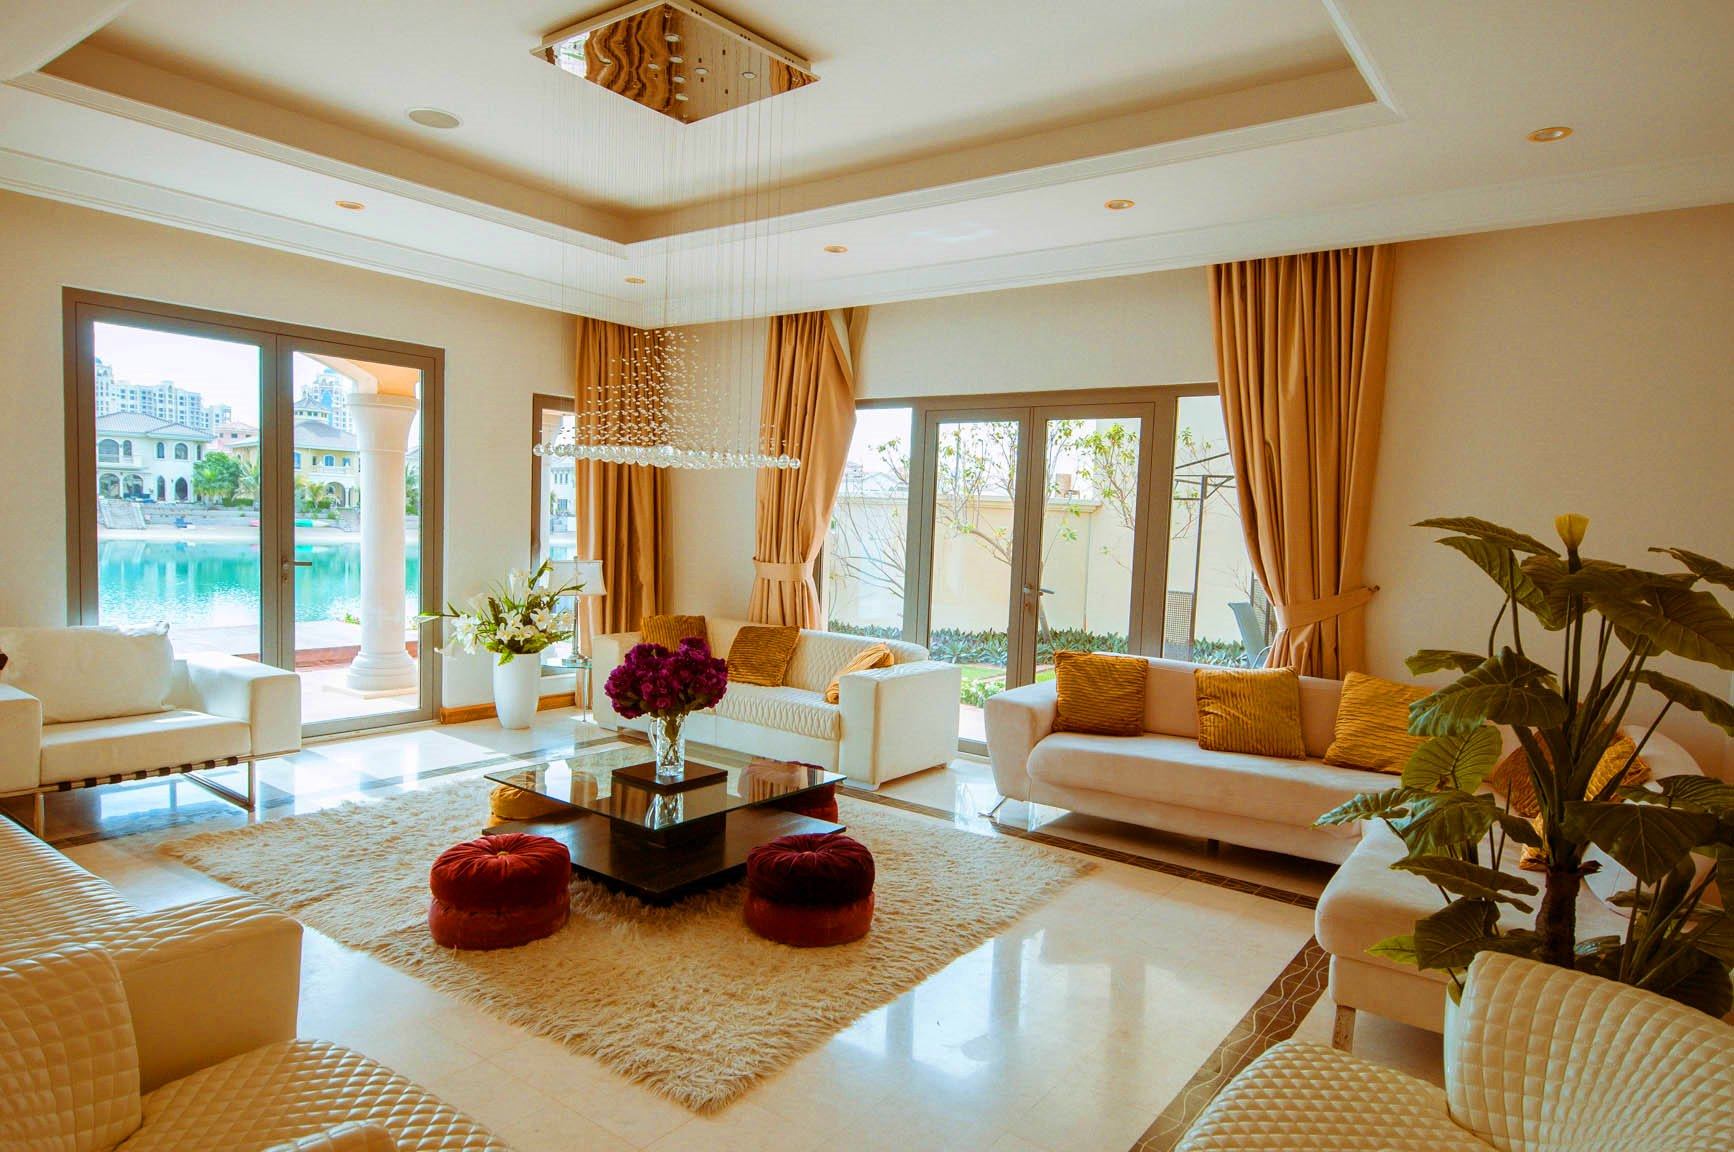 Grand Foyer 4BR villa Burj Al Arab view